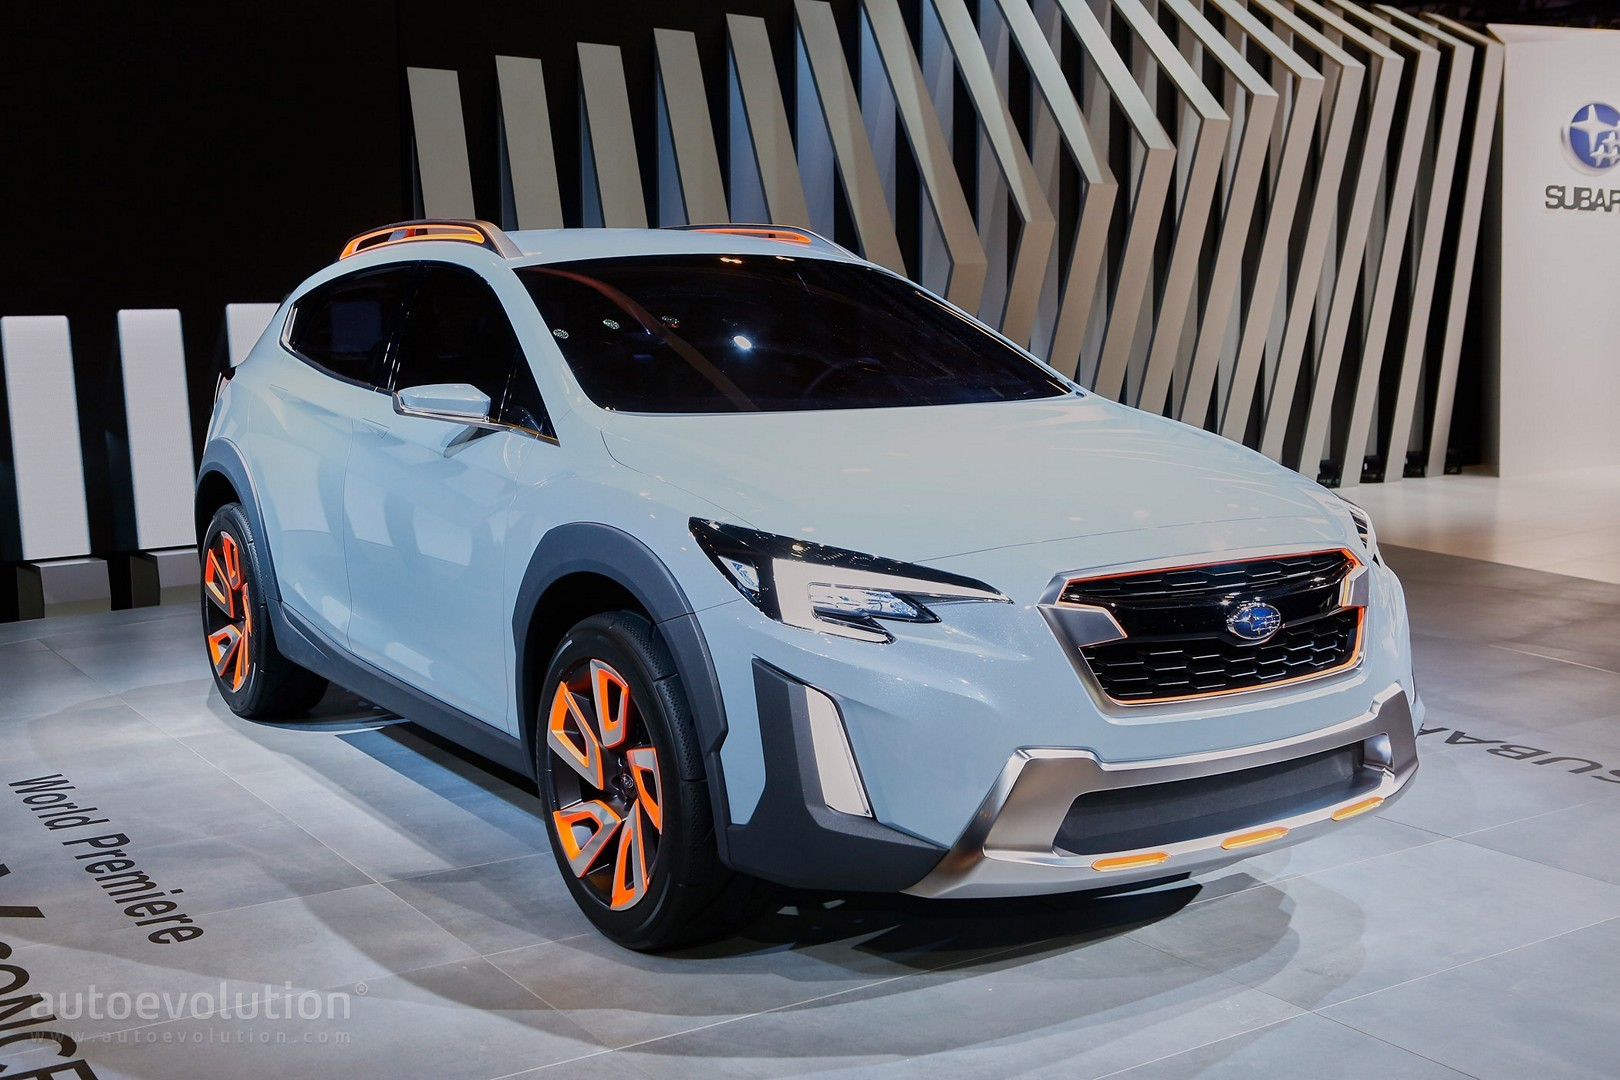 2017 Subaru XV / Crosstrek Previewed by This Rugged Concept in Geneva ...